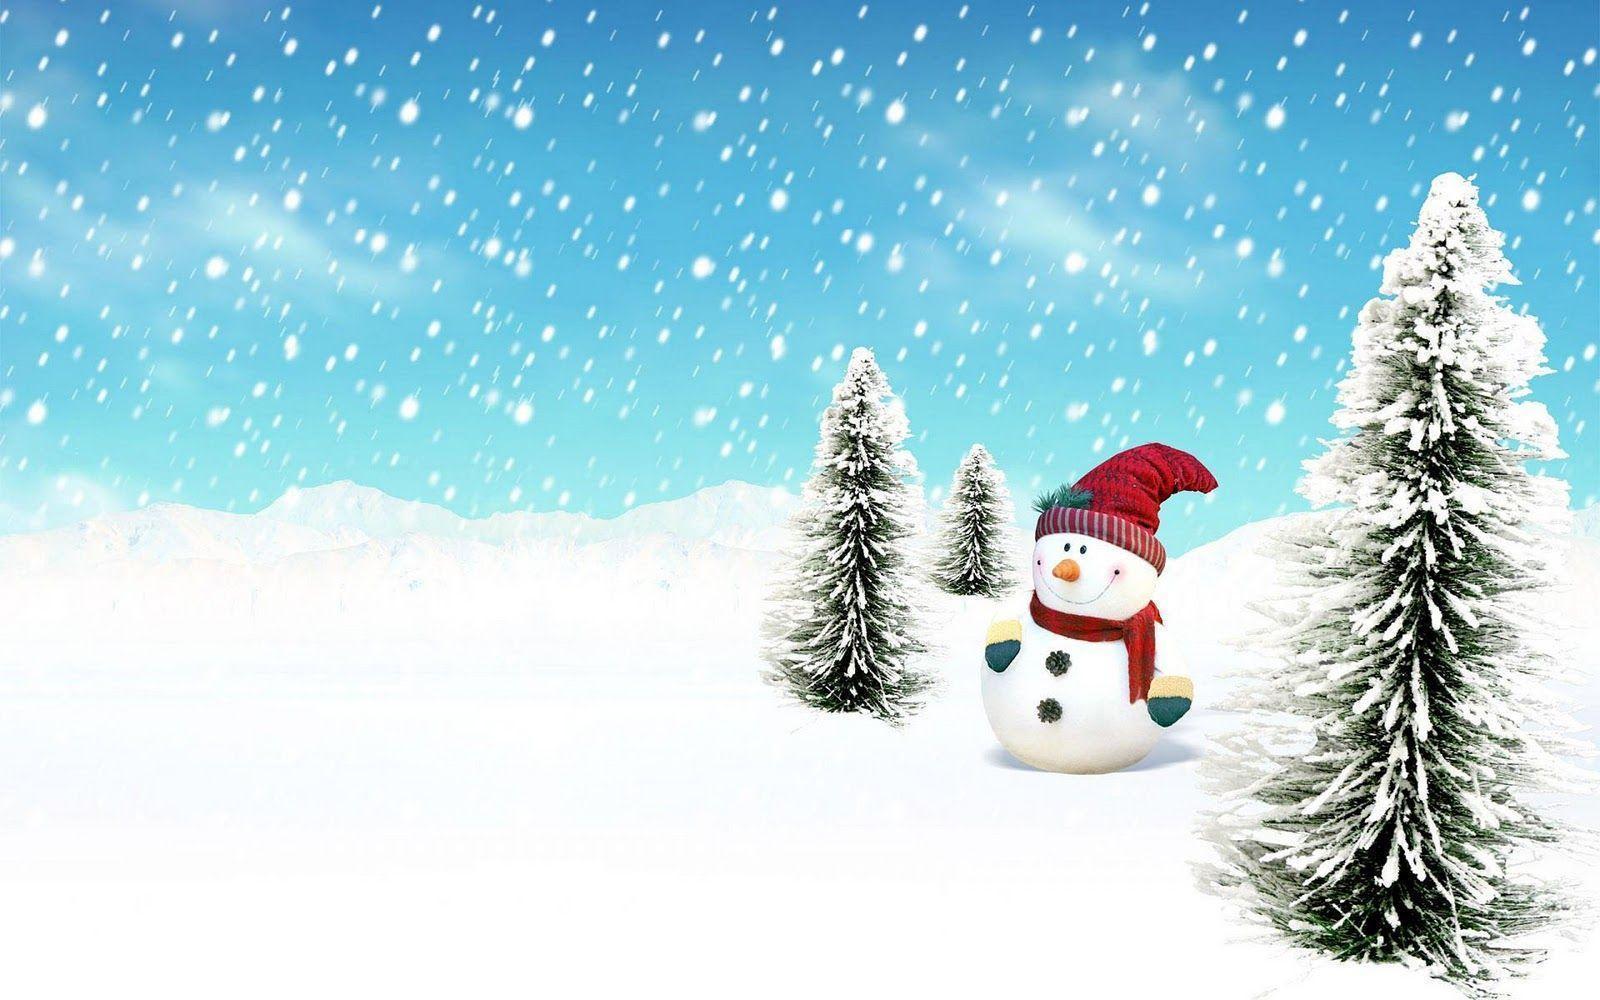 Winter Snowman Wallpaper - WallpaperSafari